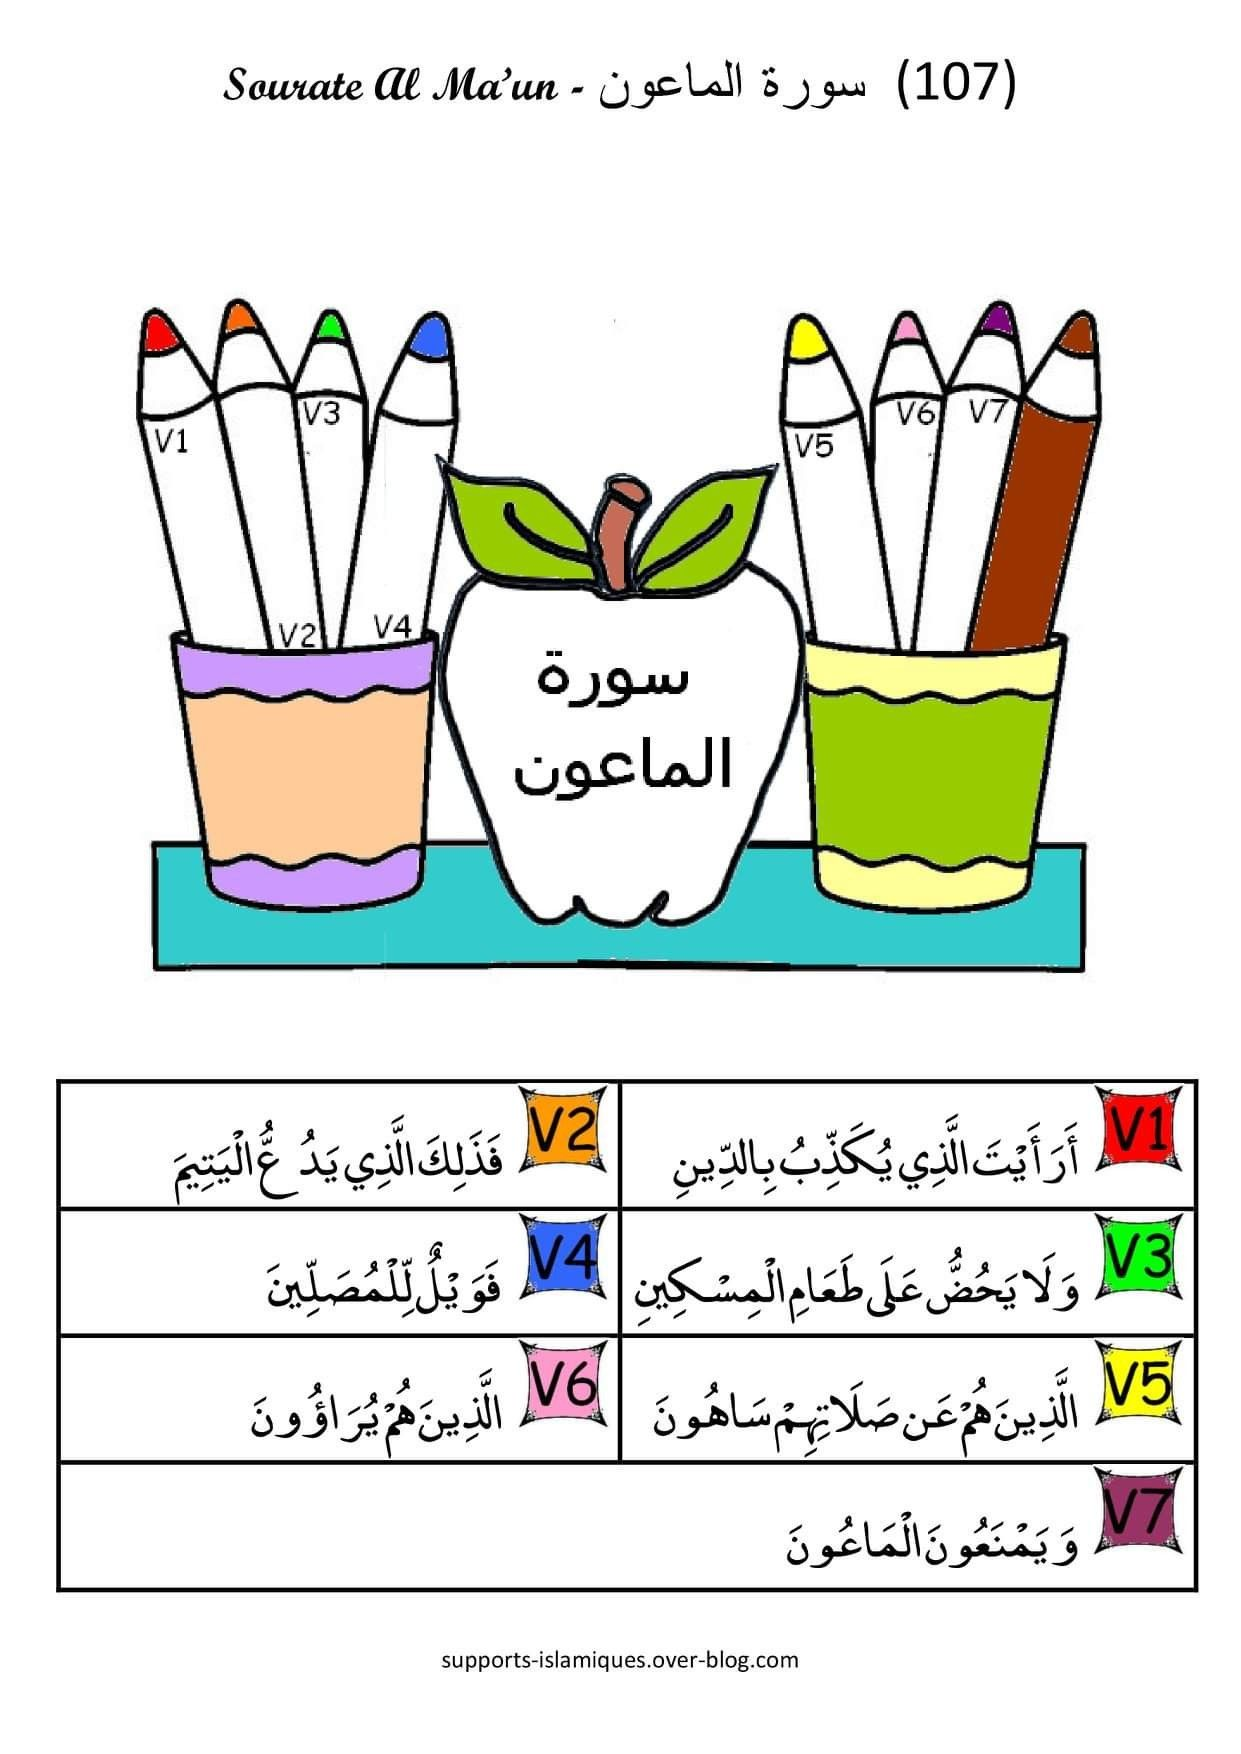 Pin By Sana Jbr On قرآن للأطفال Islamic Kids Activities Arabic Kids Muslim Kids Activities